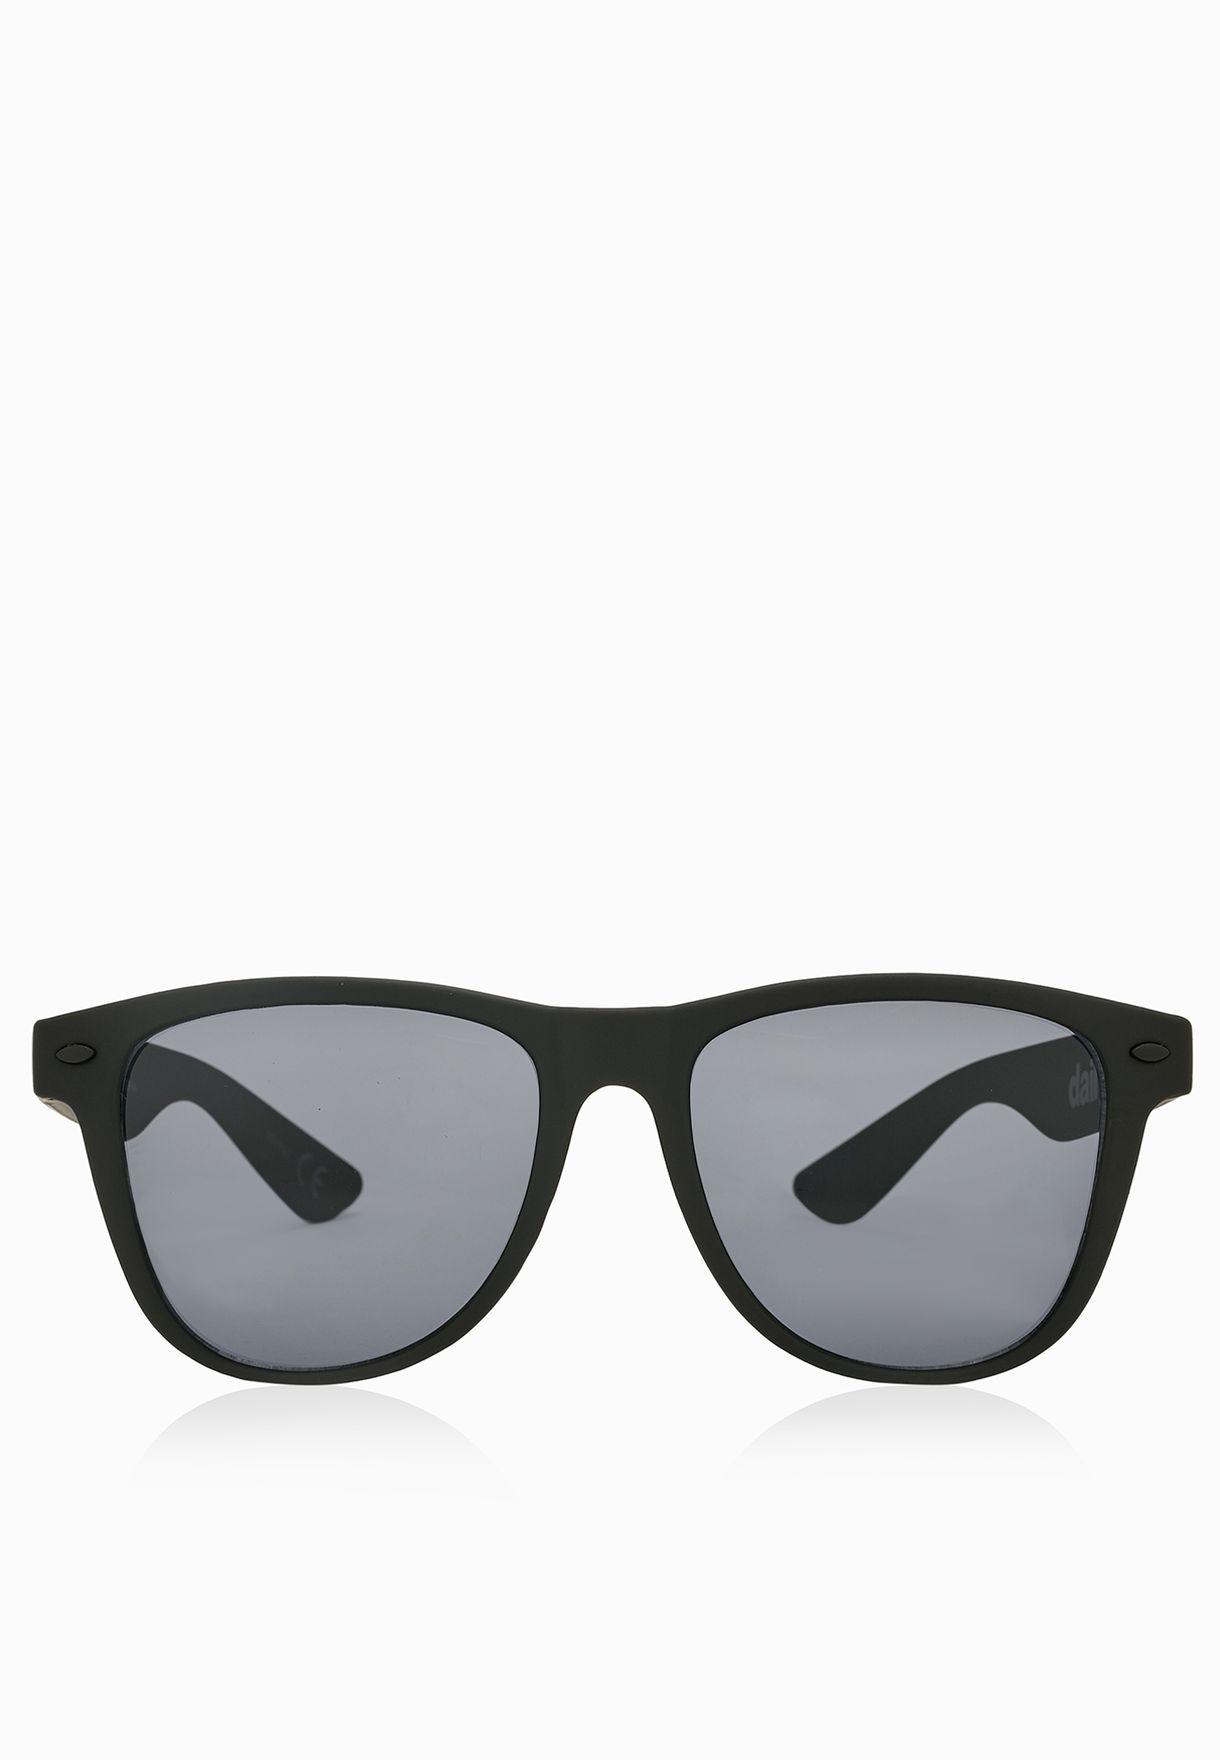 9c8720a1c9 Shop Neff fall black Daily Sunglasses for Men in Oman - NE706AC69TDY